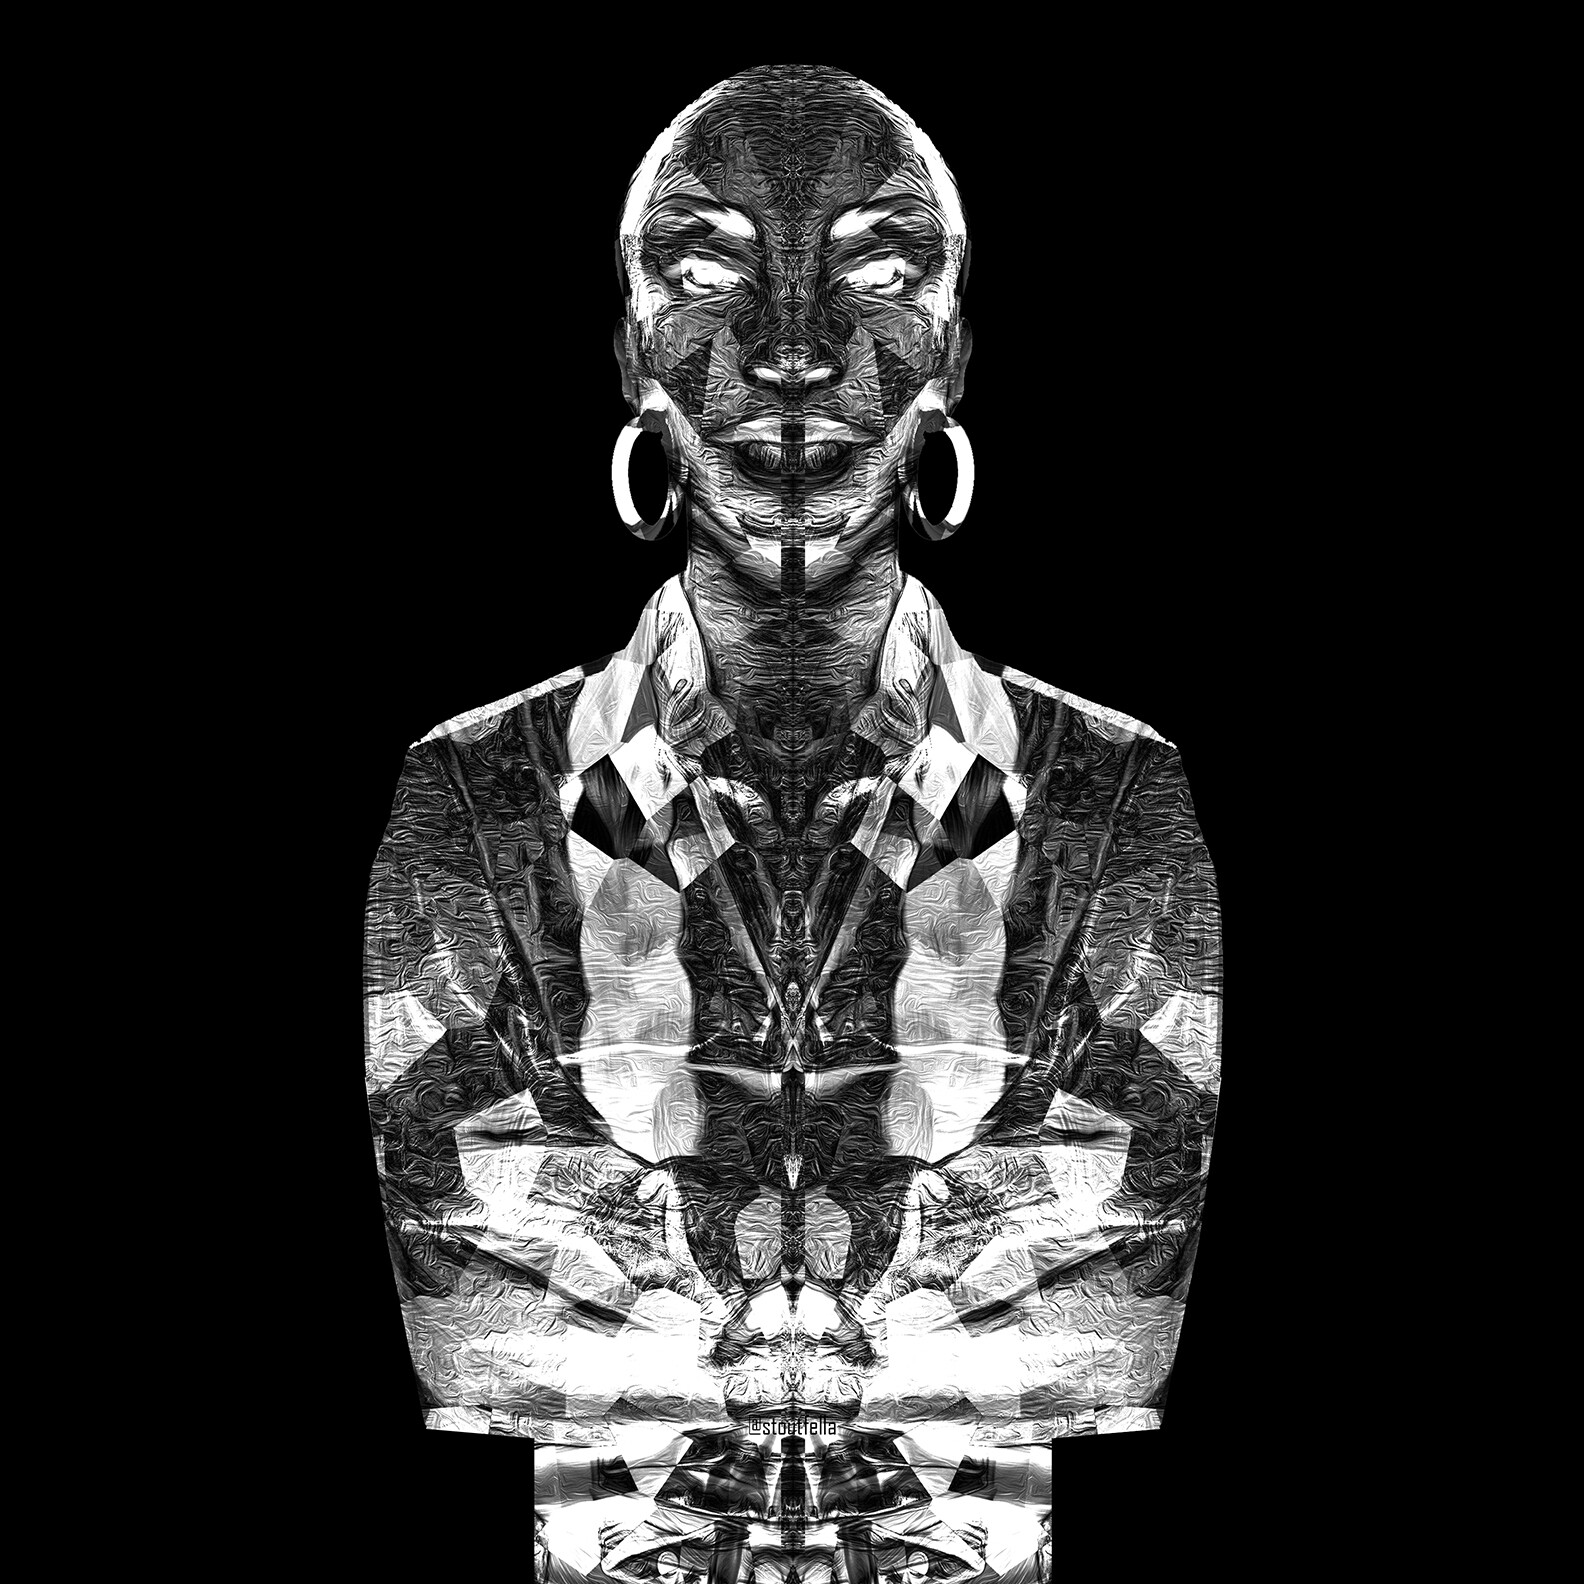 ArtStation - The Sweetest Taboo, Yohanes Haile